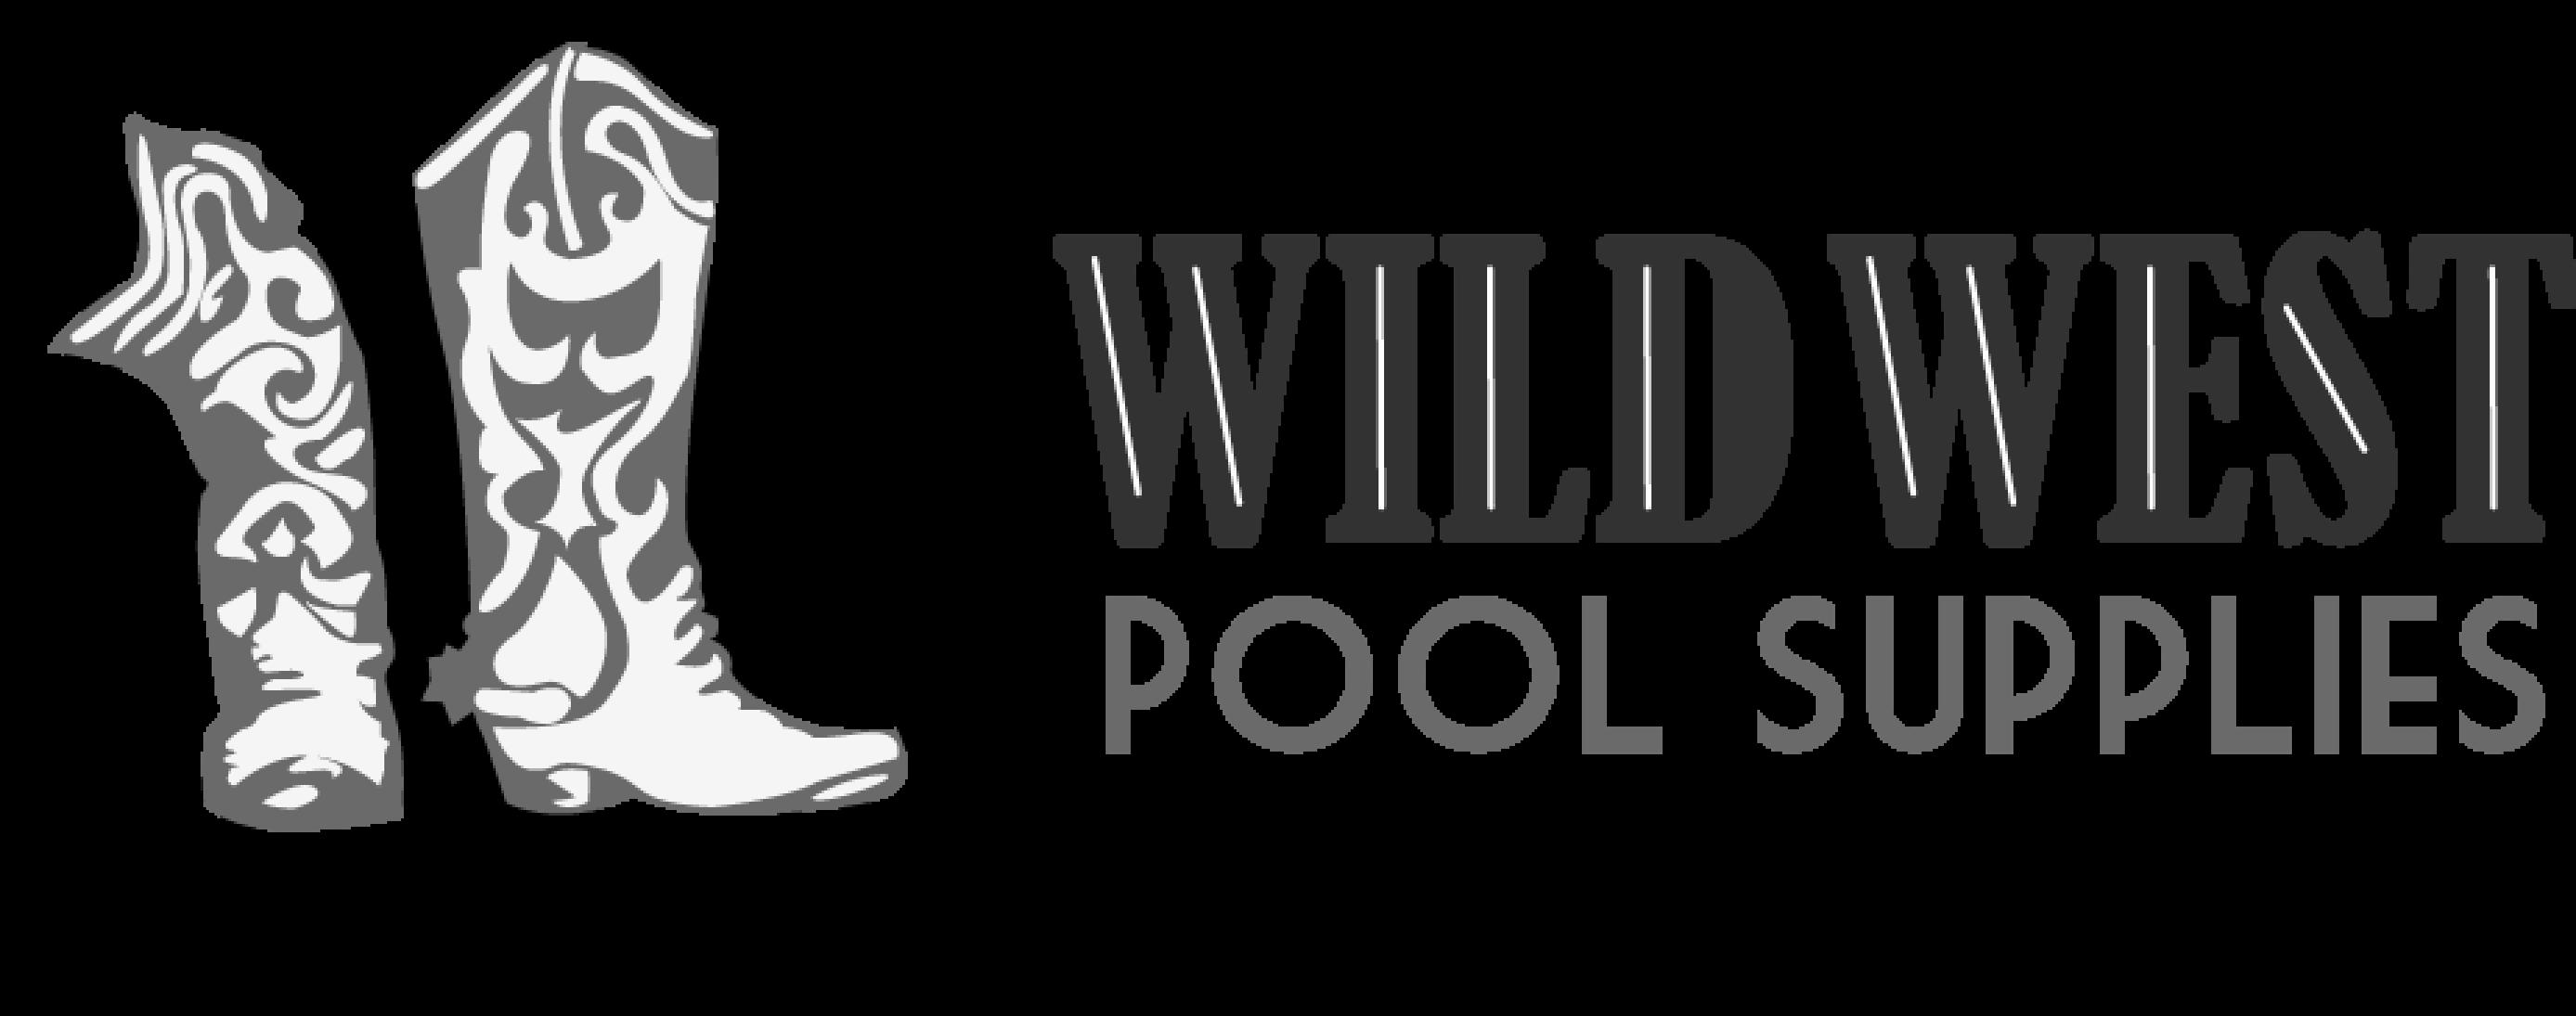 WWPS_Logo_1 - BW